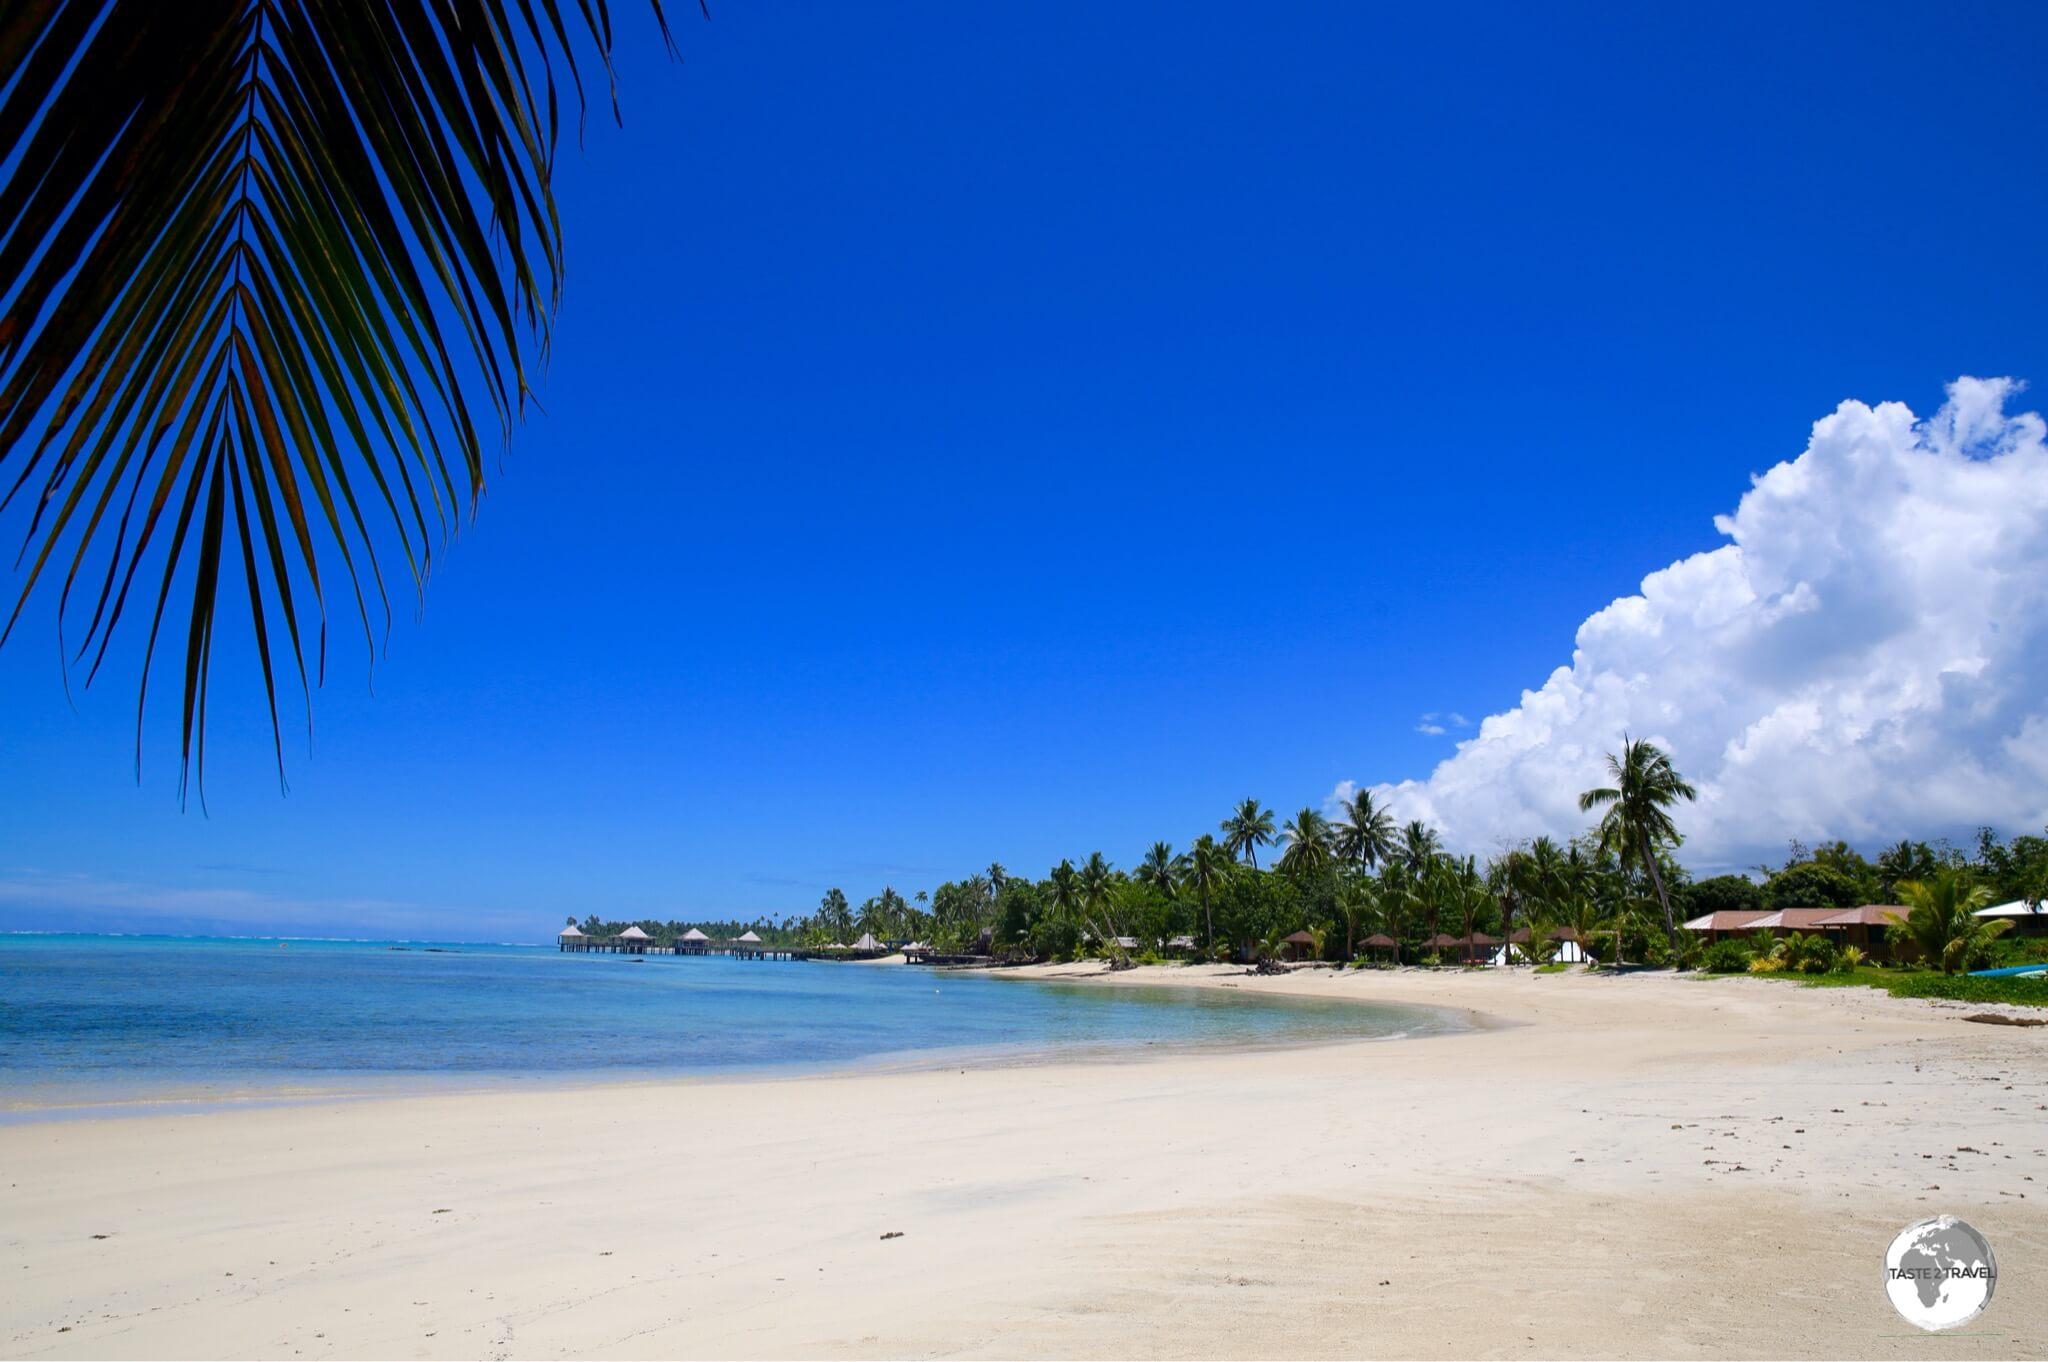 Beautiful Maninoa beach lies between Sinalei Reef Resort & Spa and Coconuts Beach Club Resort & Spa (background).